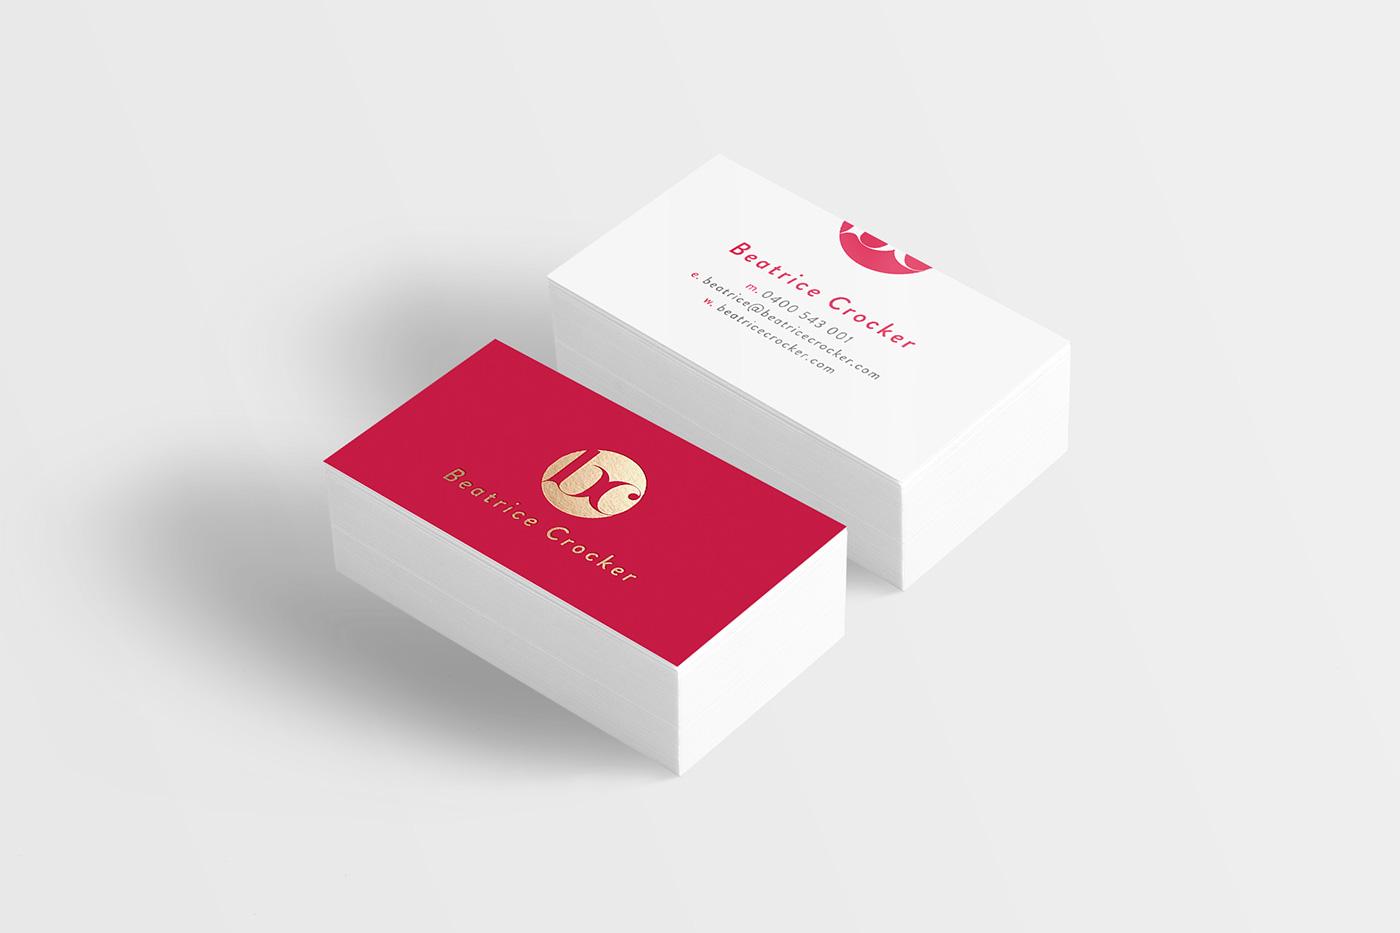 Beatrice-Crocker_business-cards-02.jpg